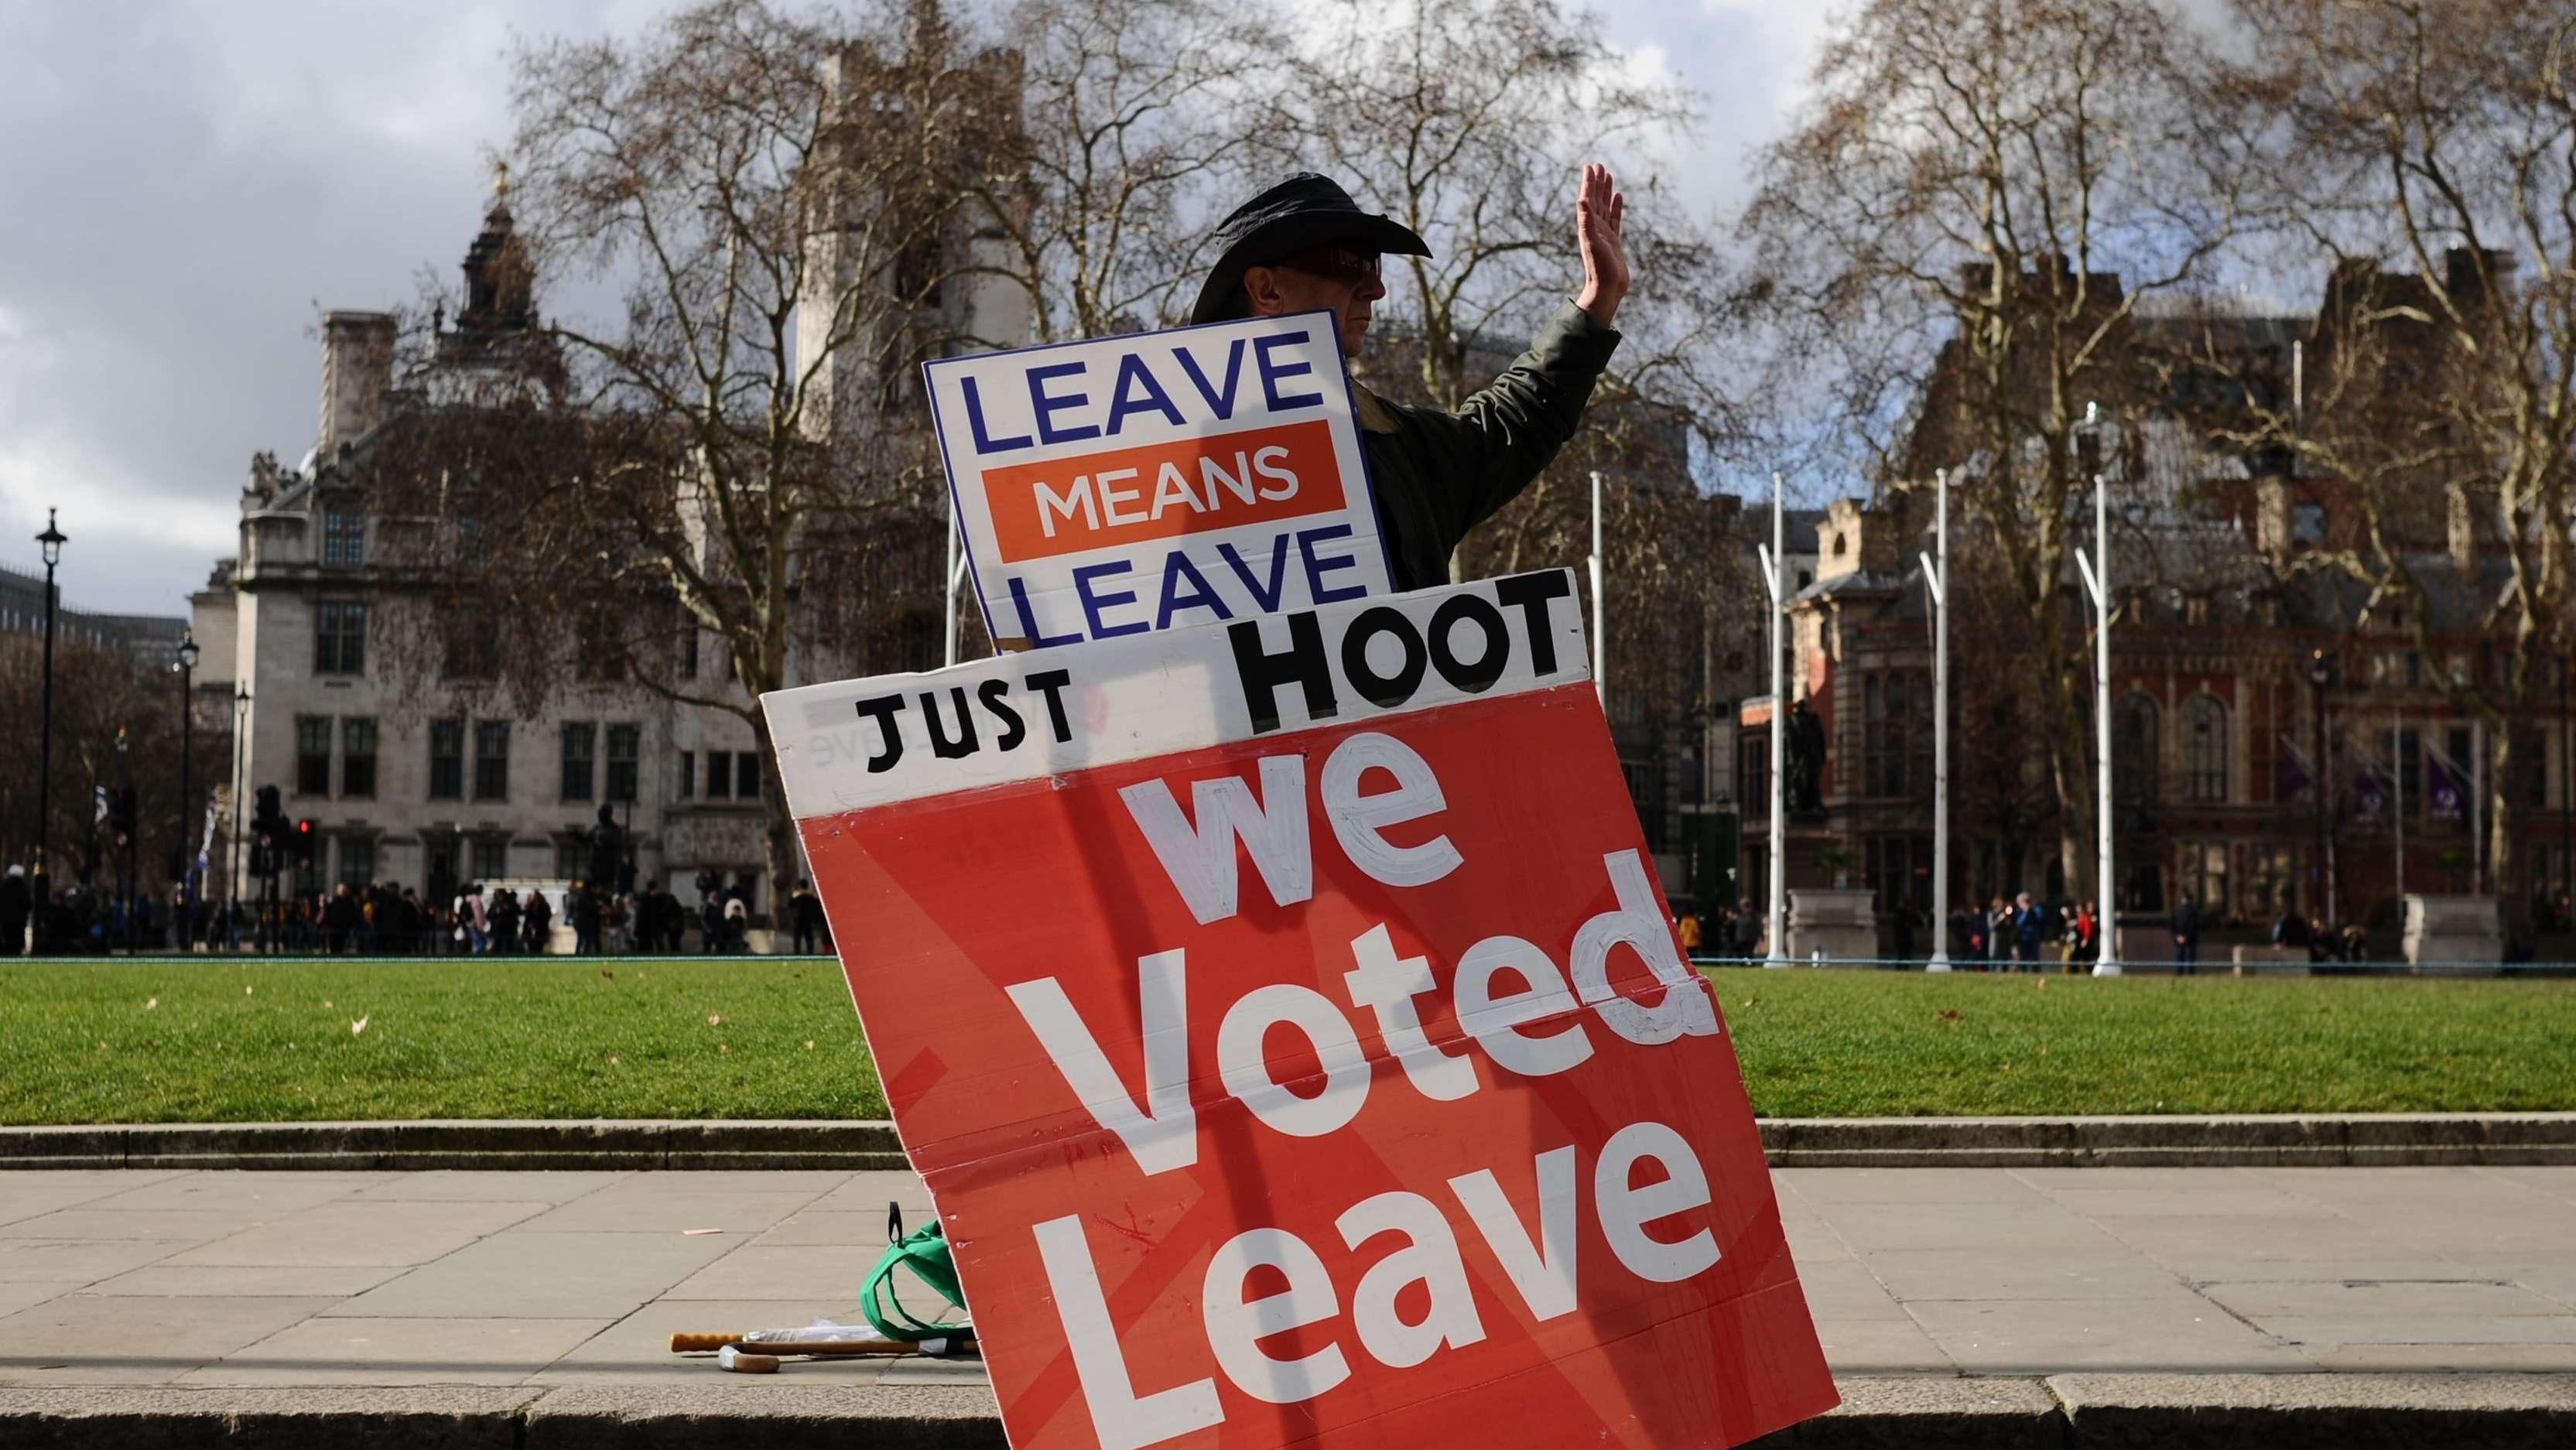 Pro Brexit-Aktivist mit Plakat  in London